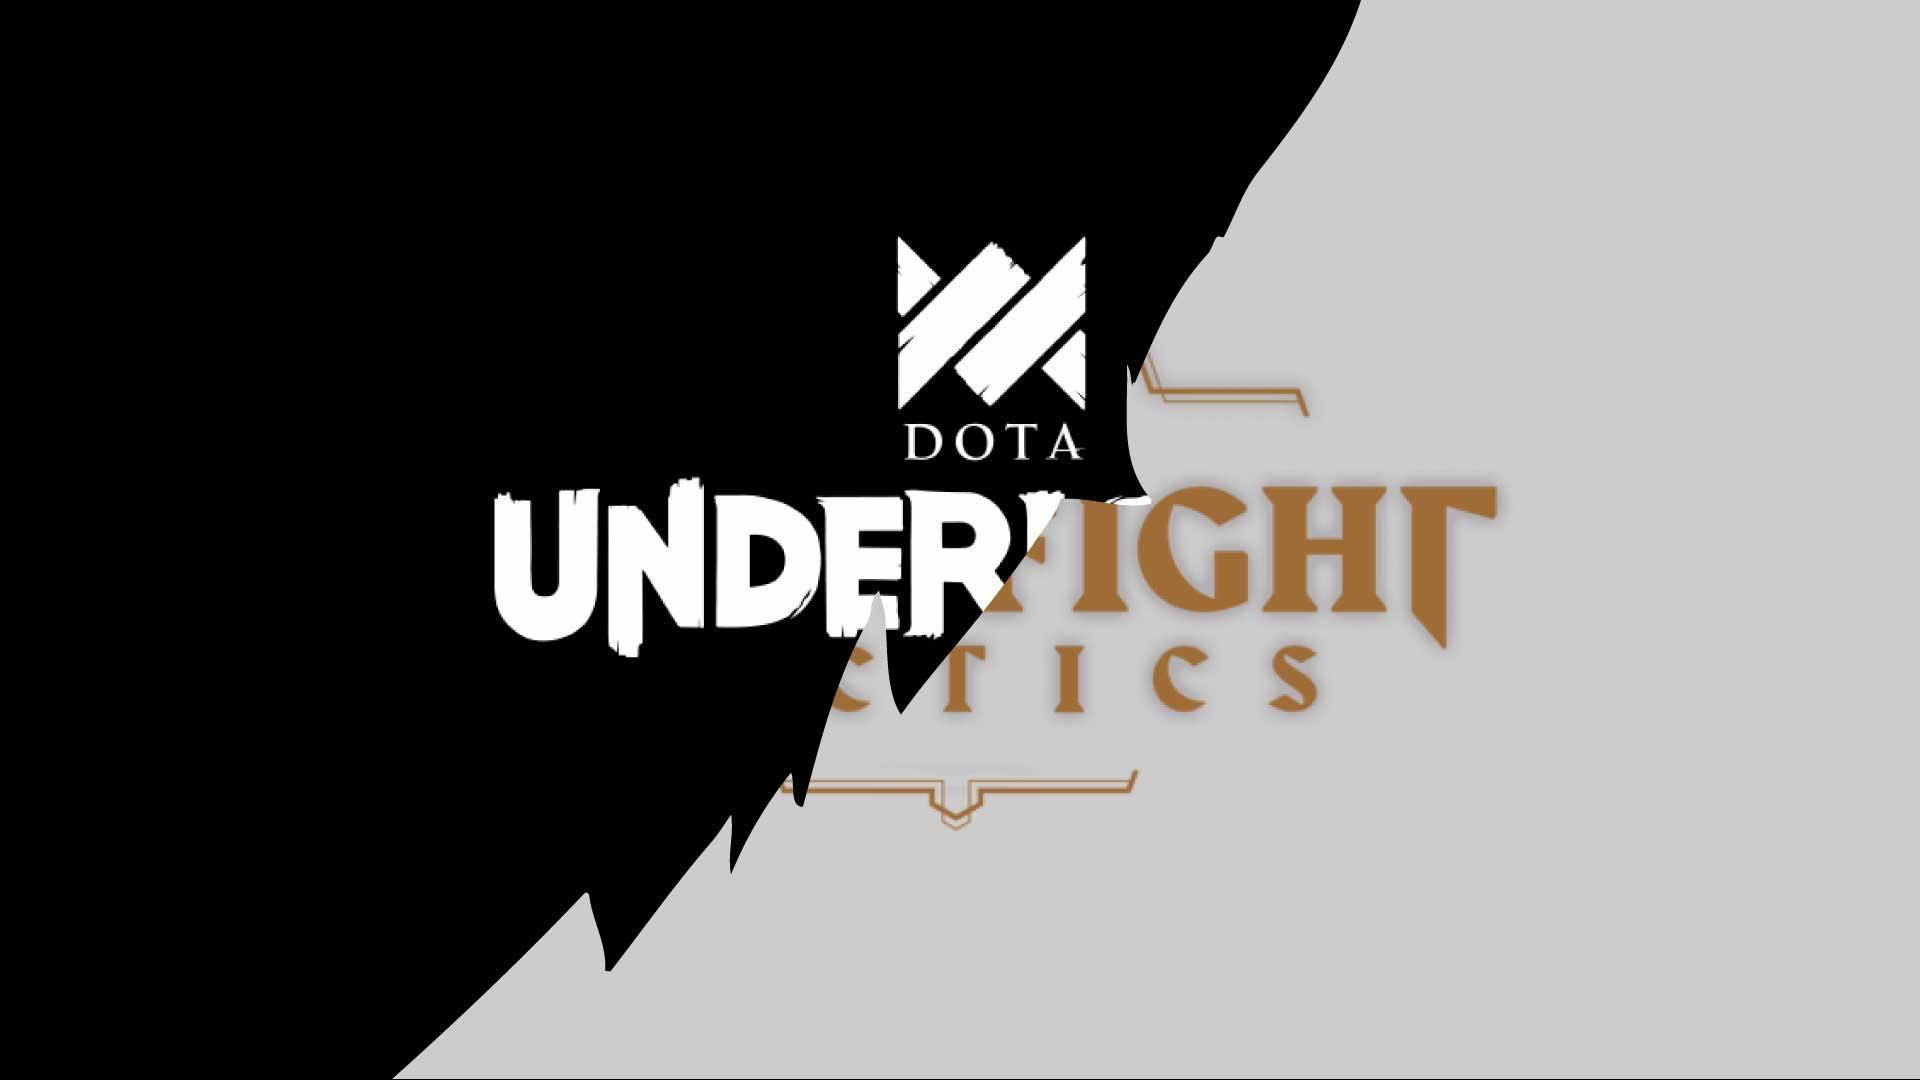 Teamfight Tactics vs Dota Underlords – Którajest lepszą betą?